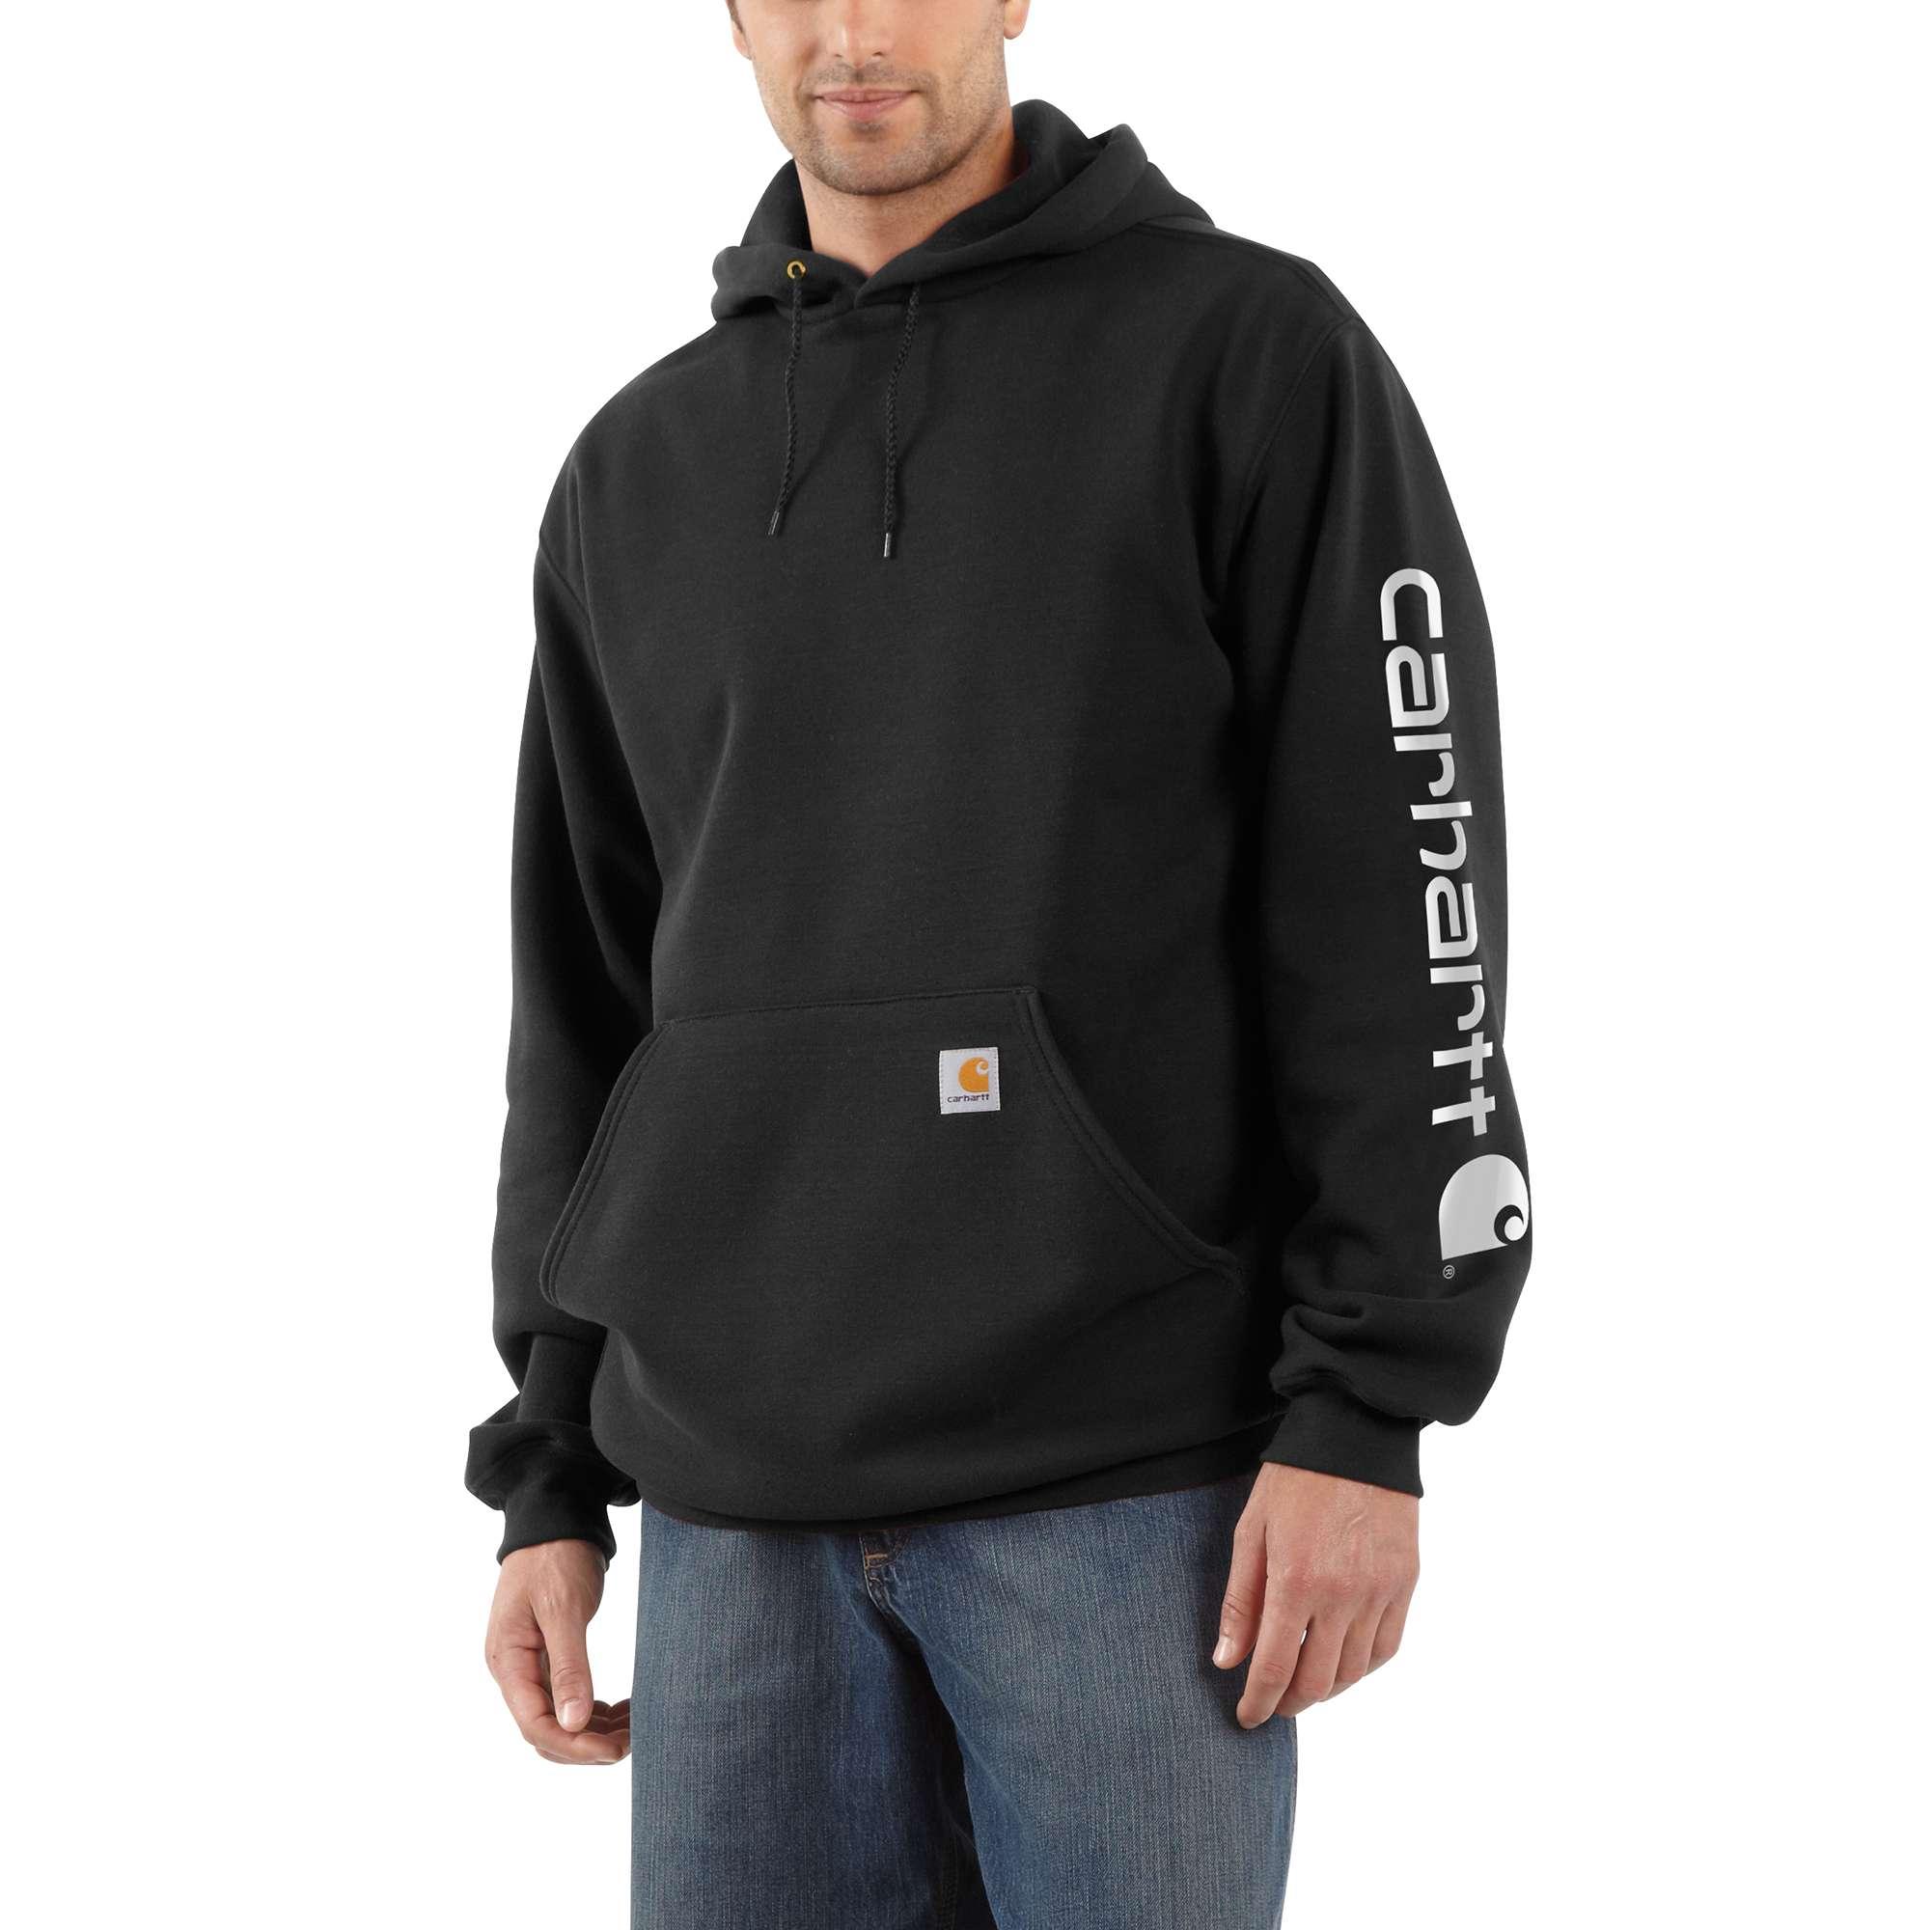 Men's Midweight Signature Logo Sleeve Hooded Sweat, Black, swatch